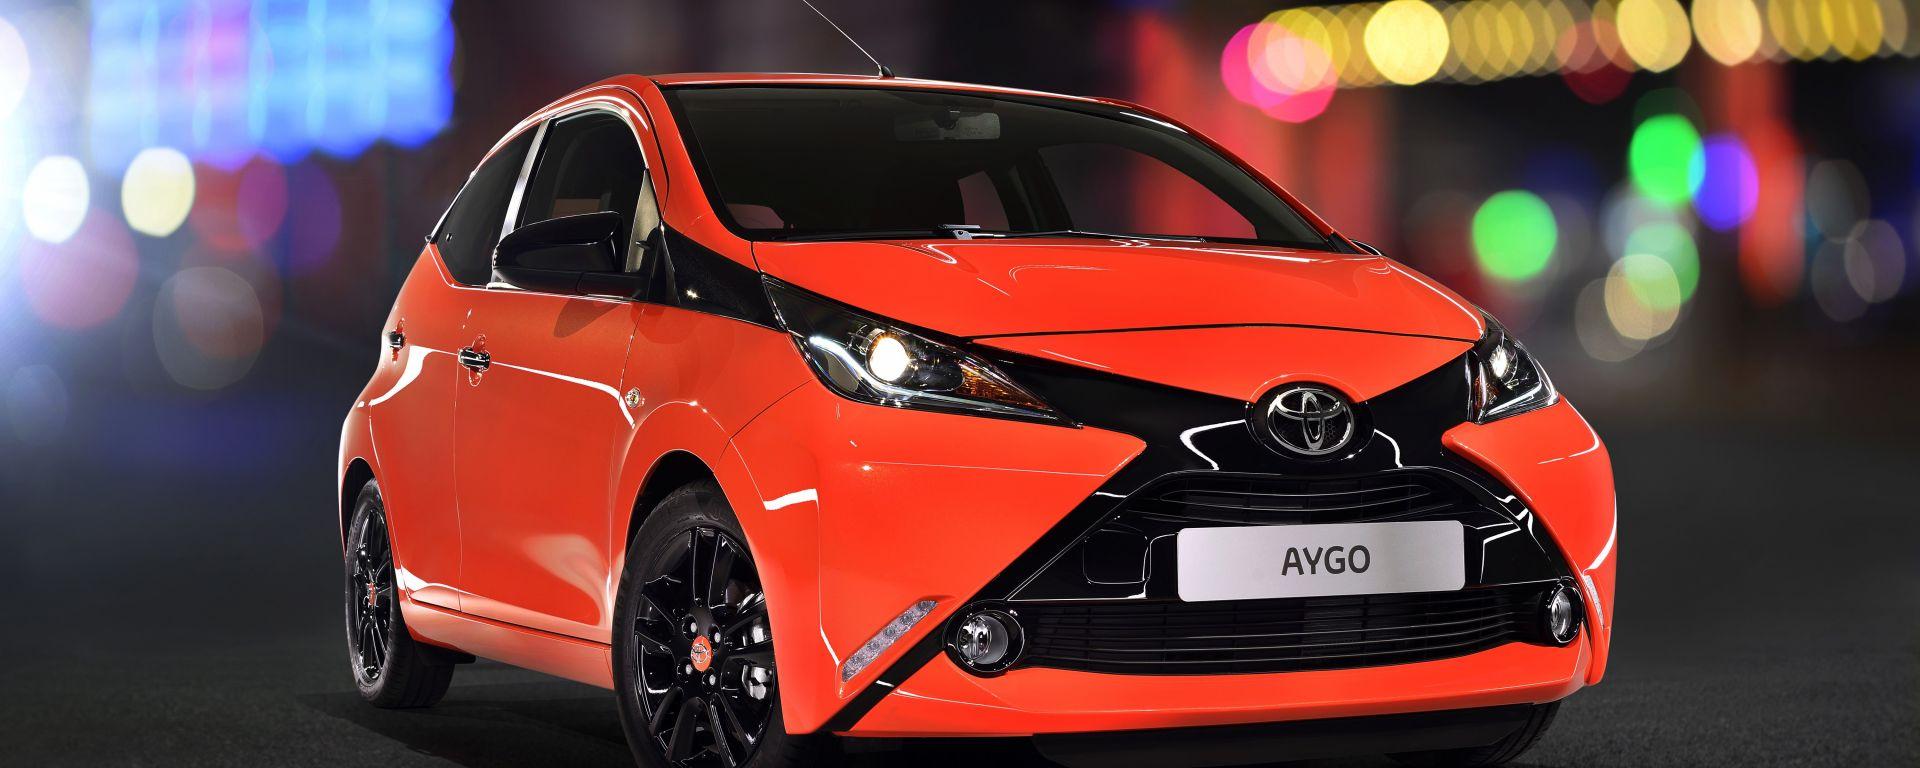 Toyota Aygo 2014, nuove foto e info